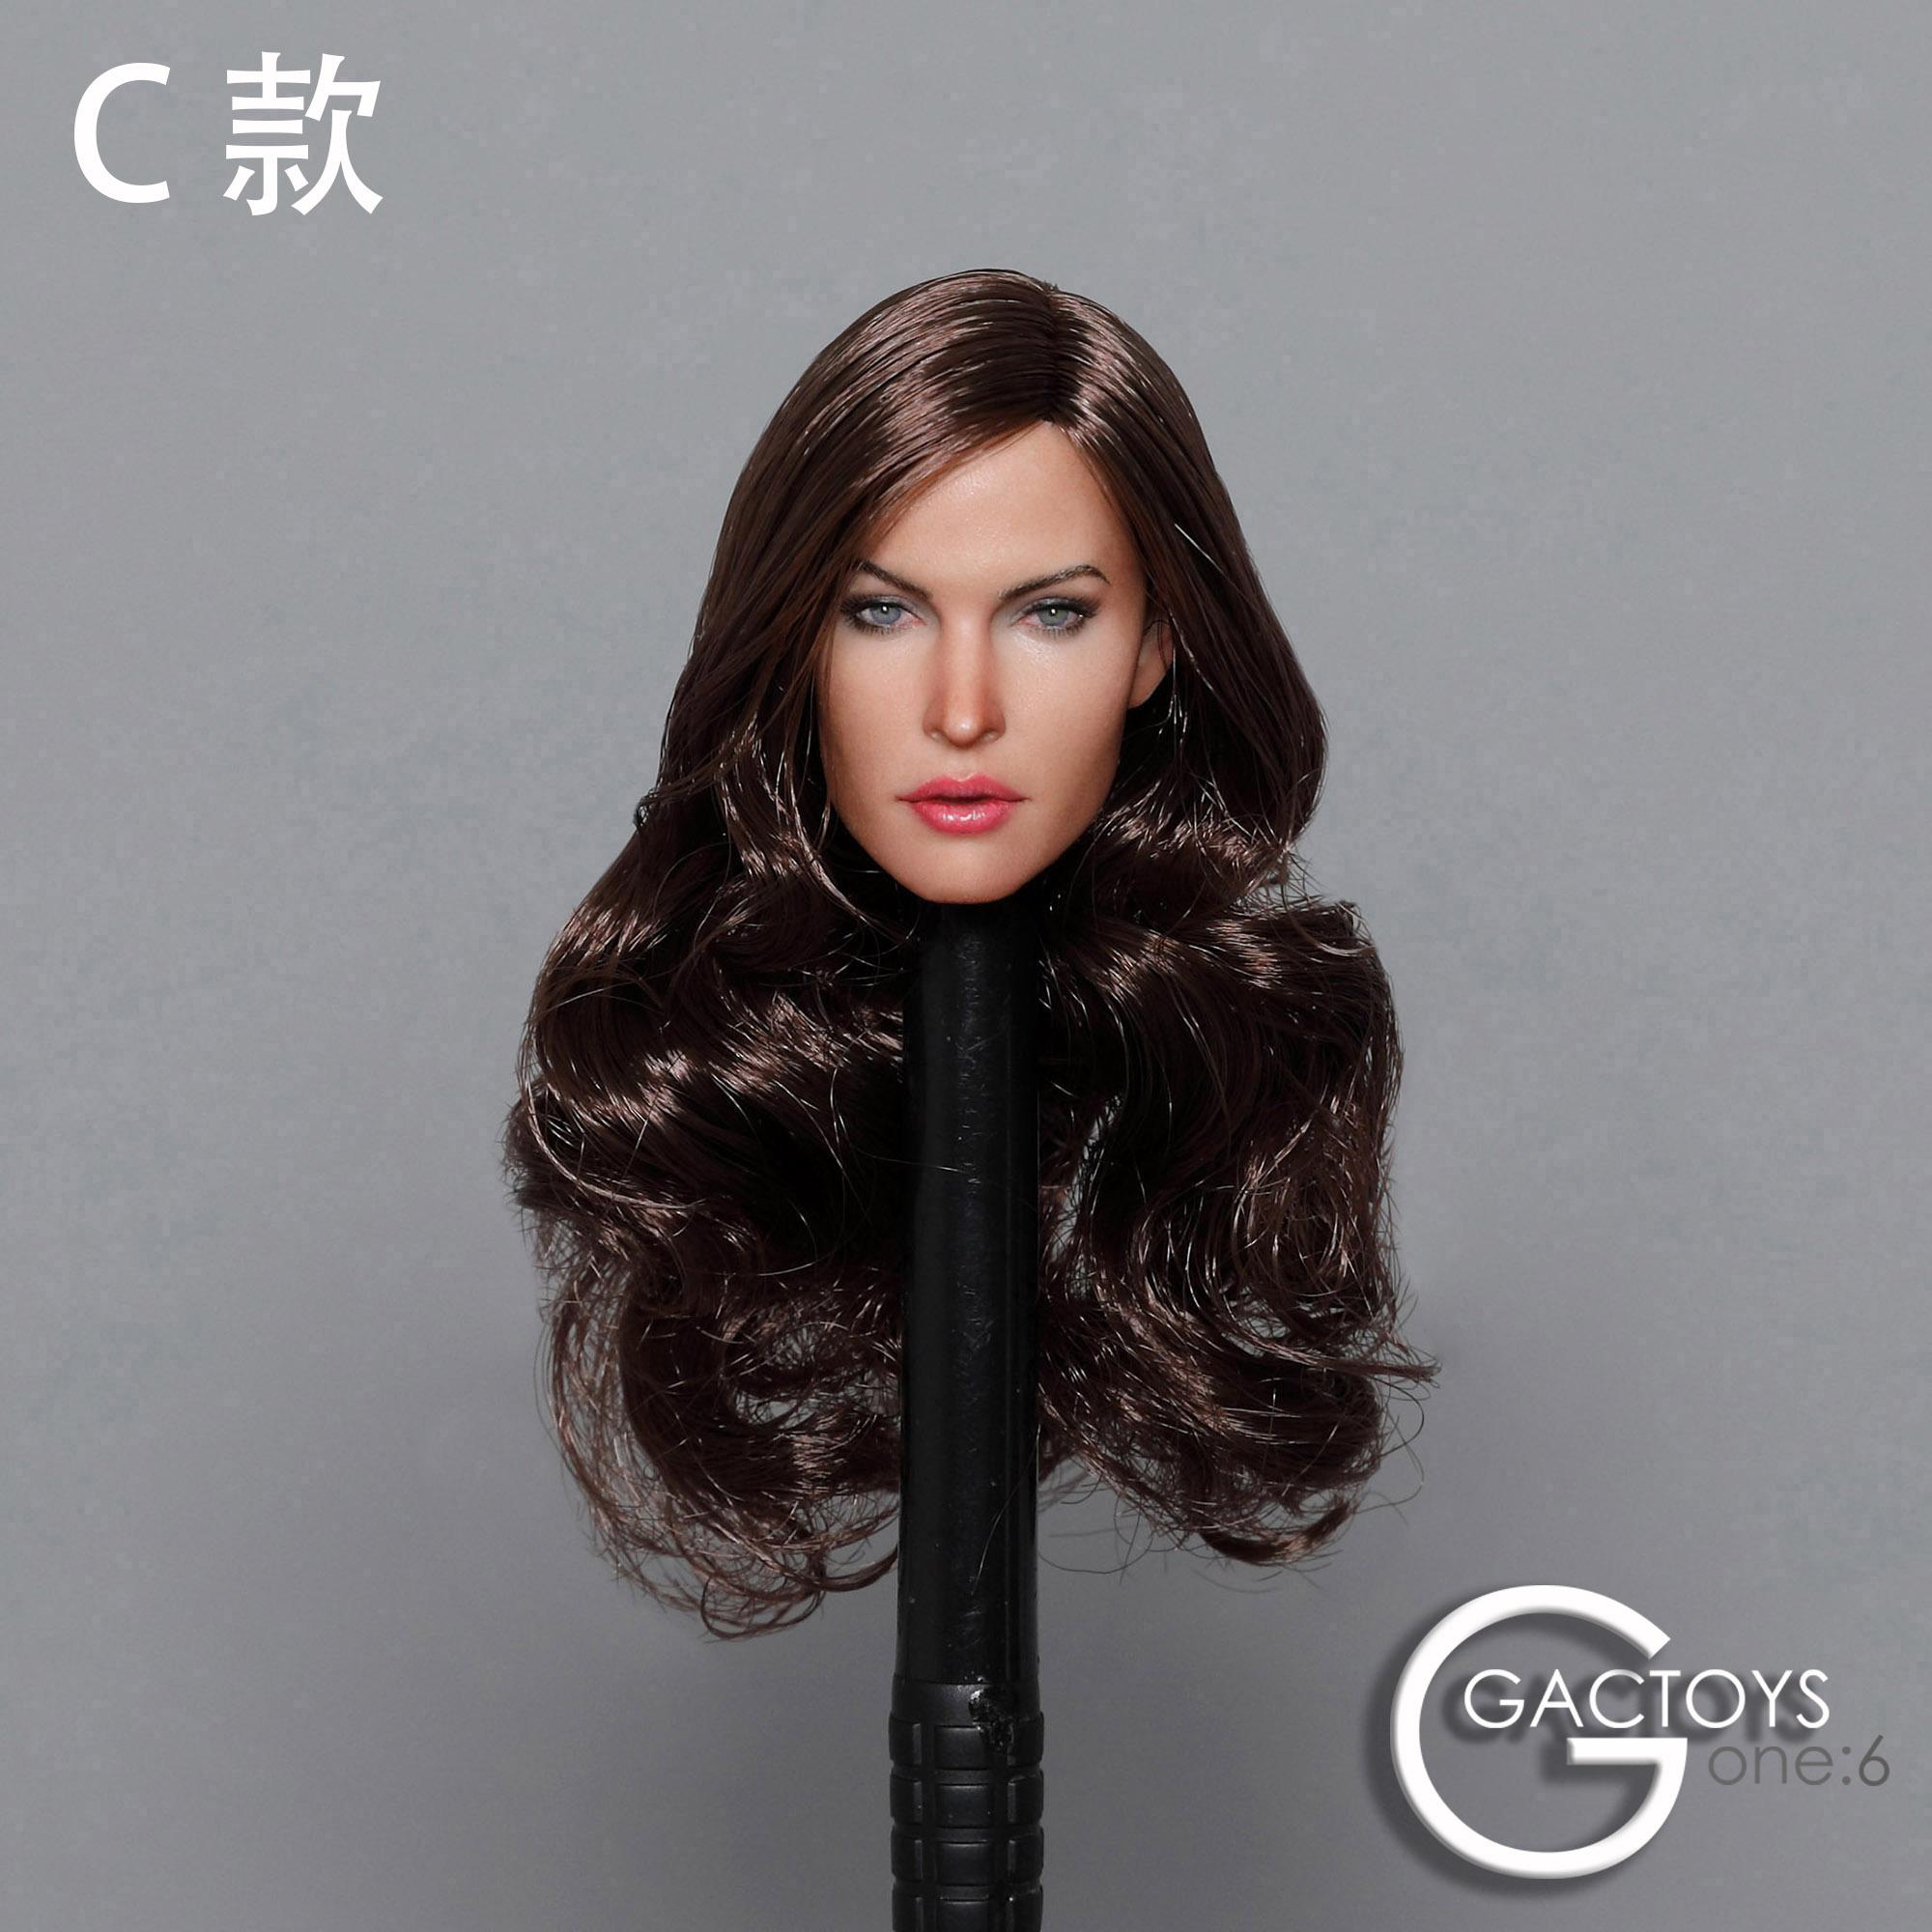 gac-femalehead05